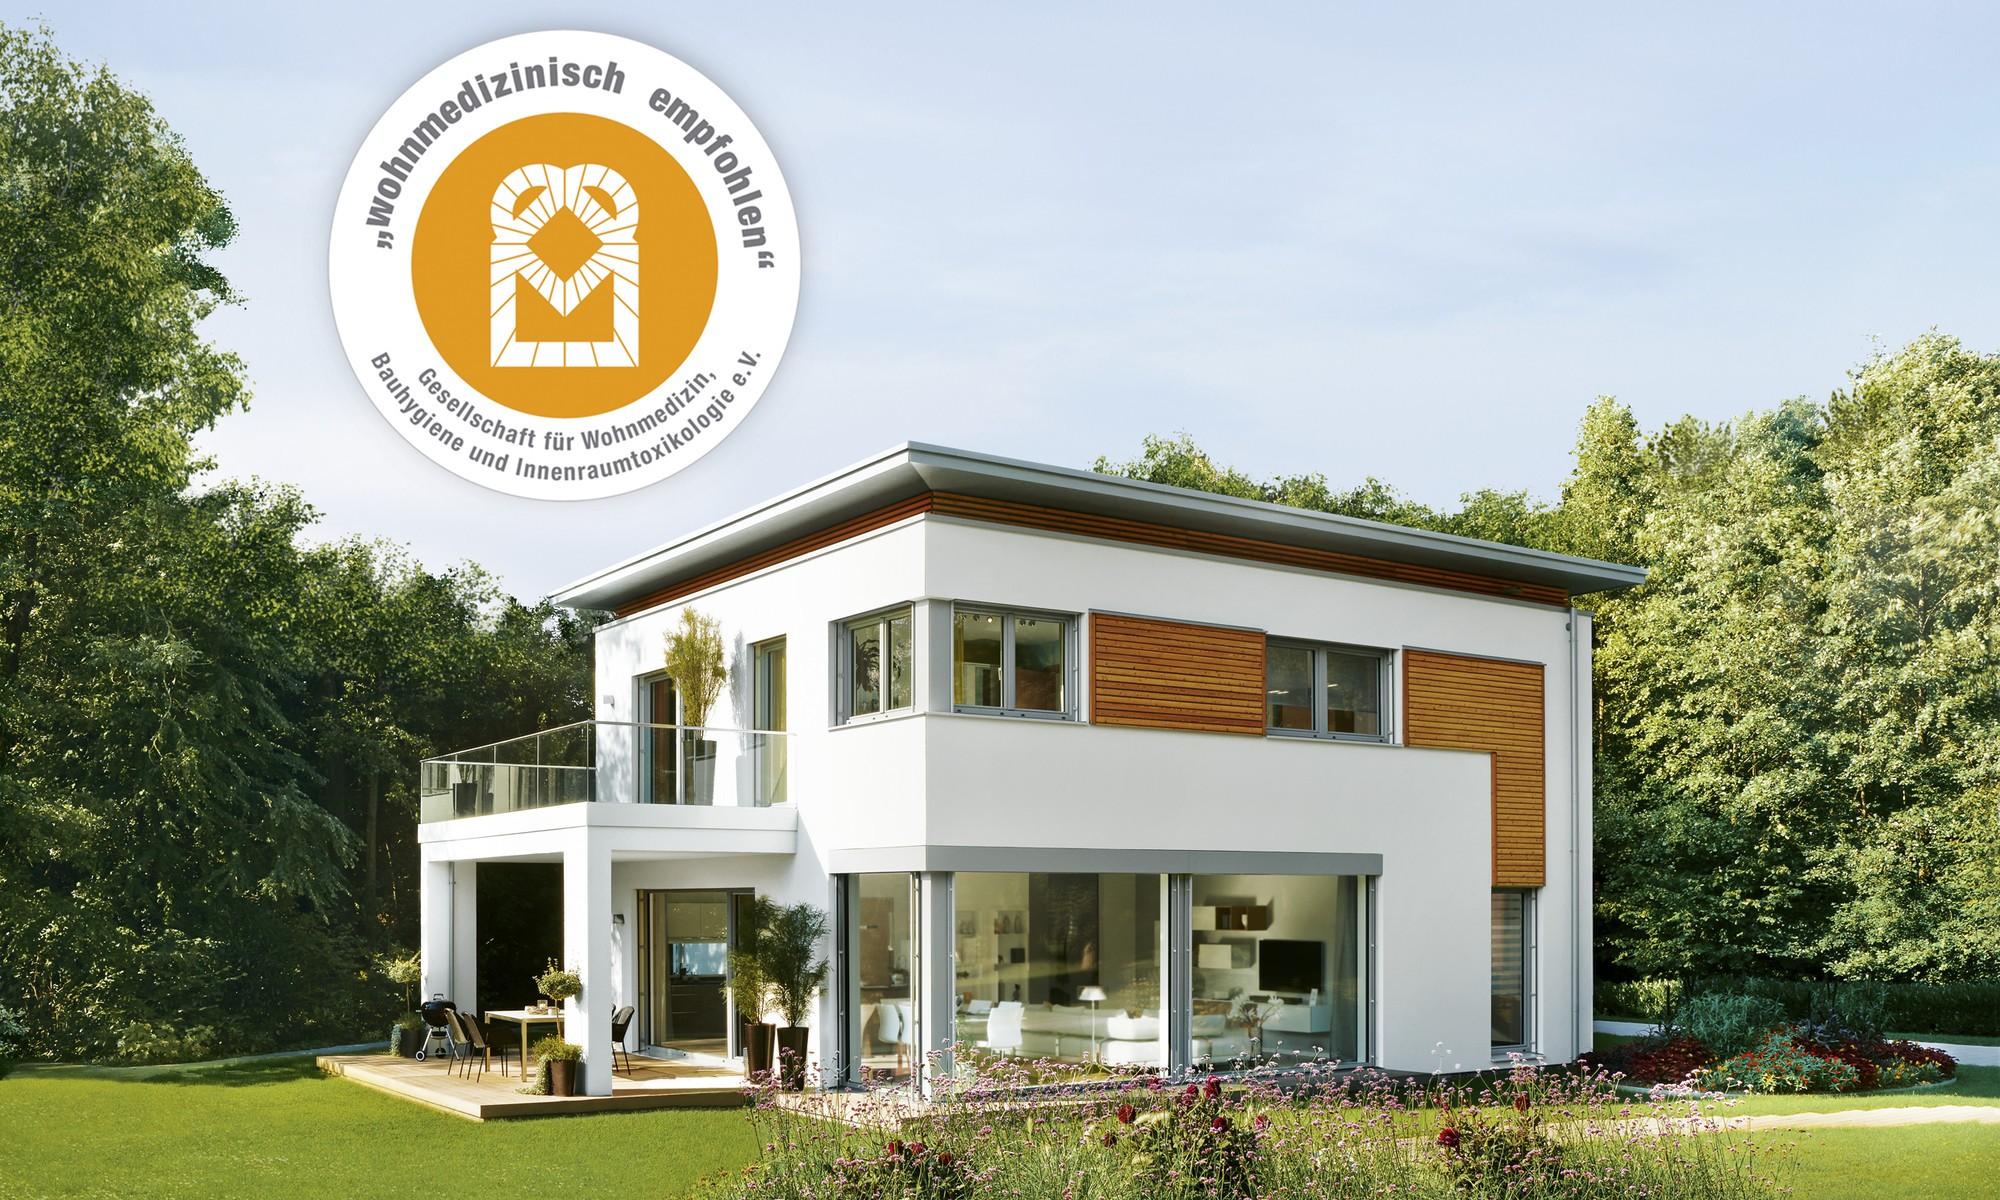 Urban, eco-friendly prefabricated house